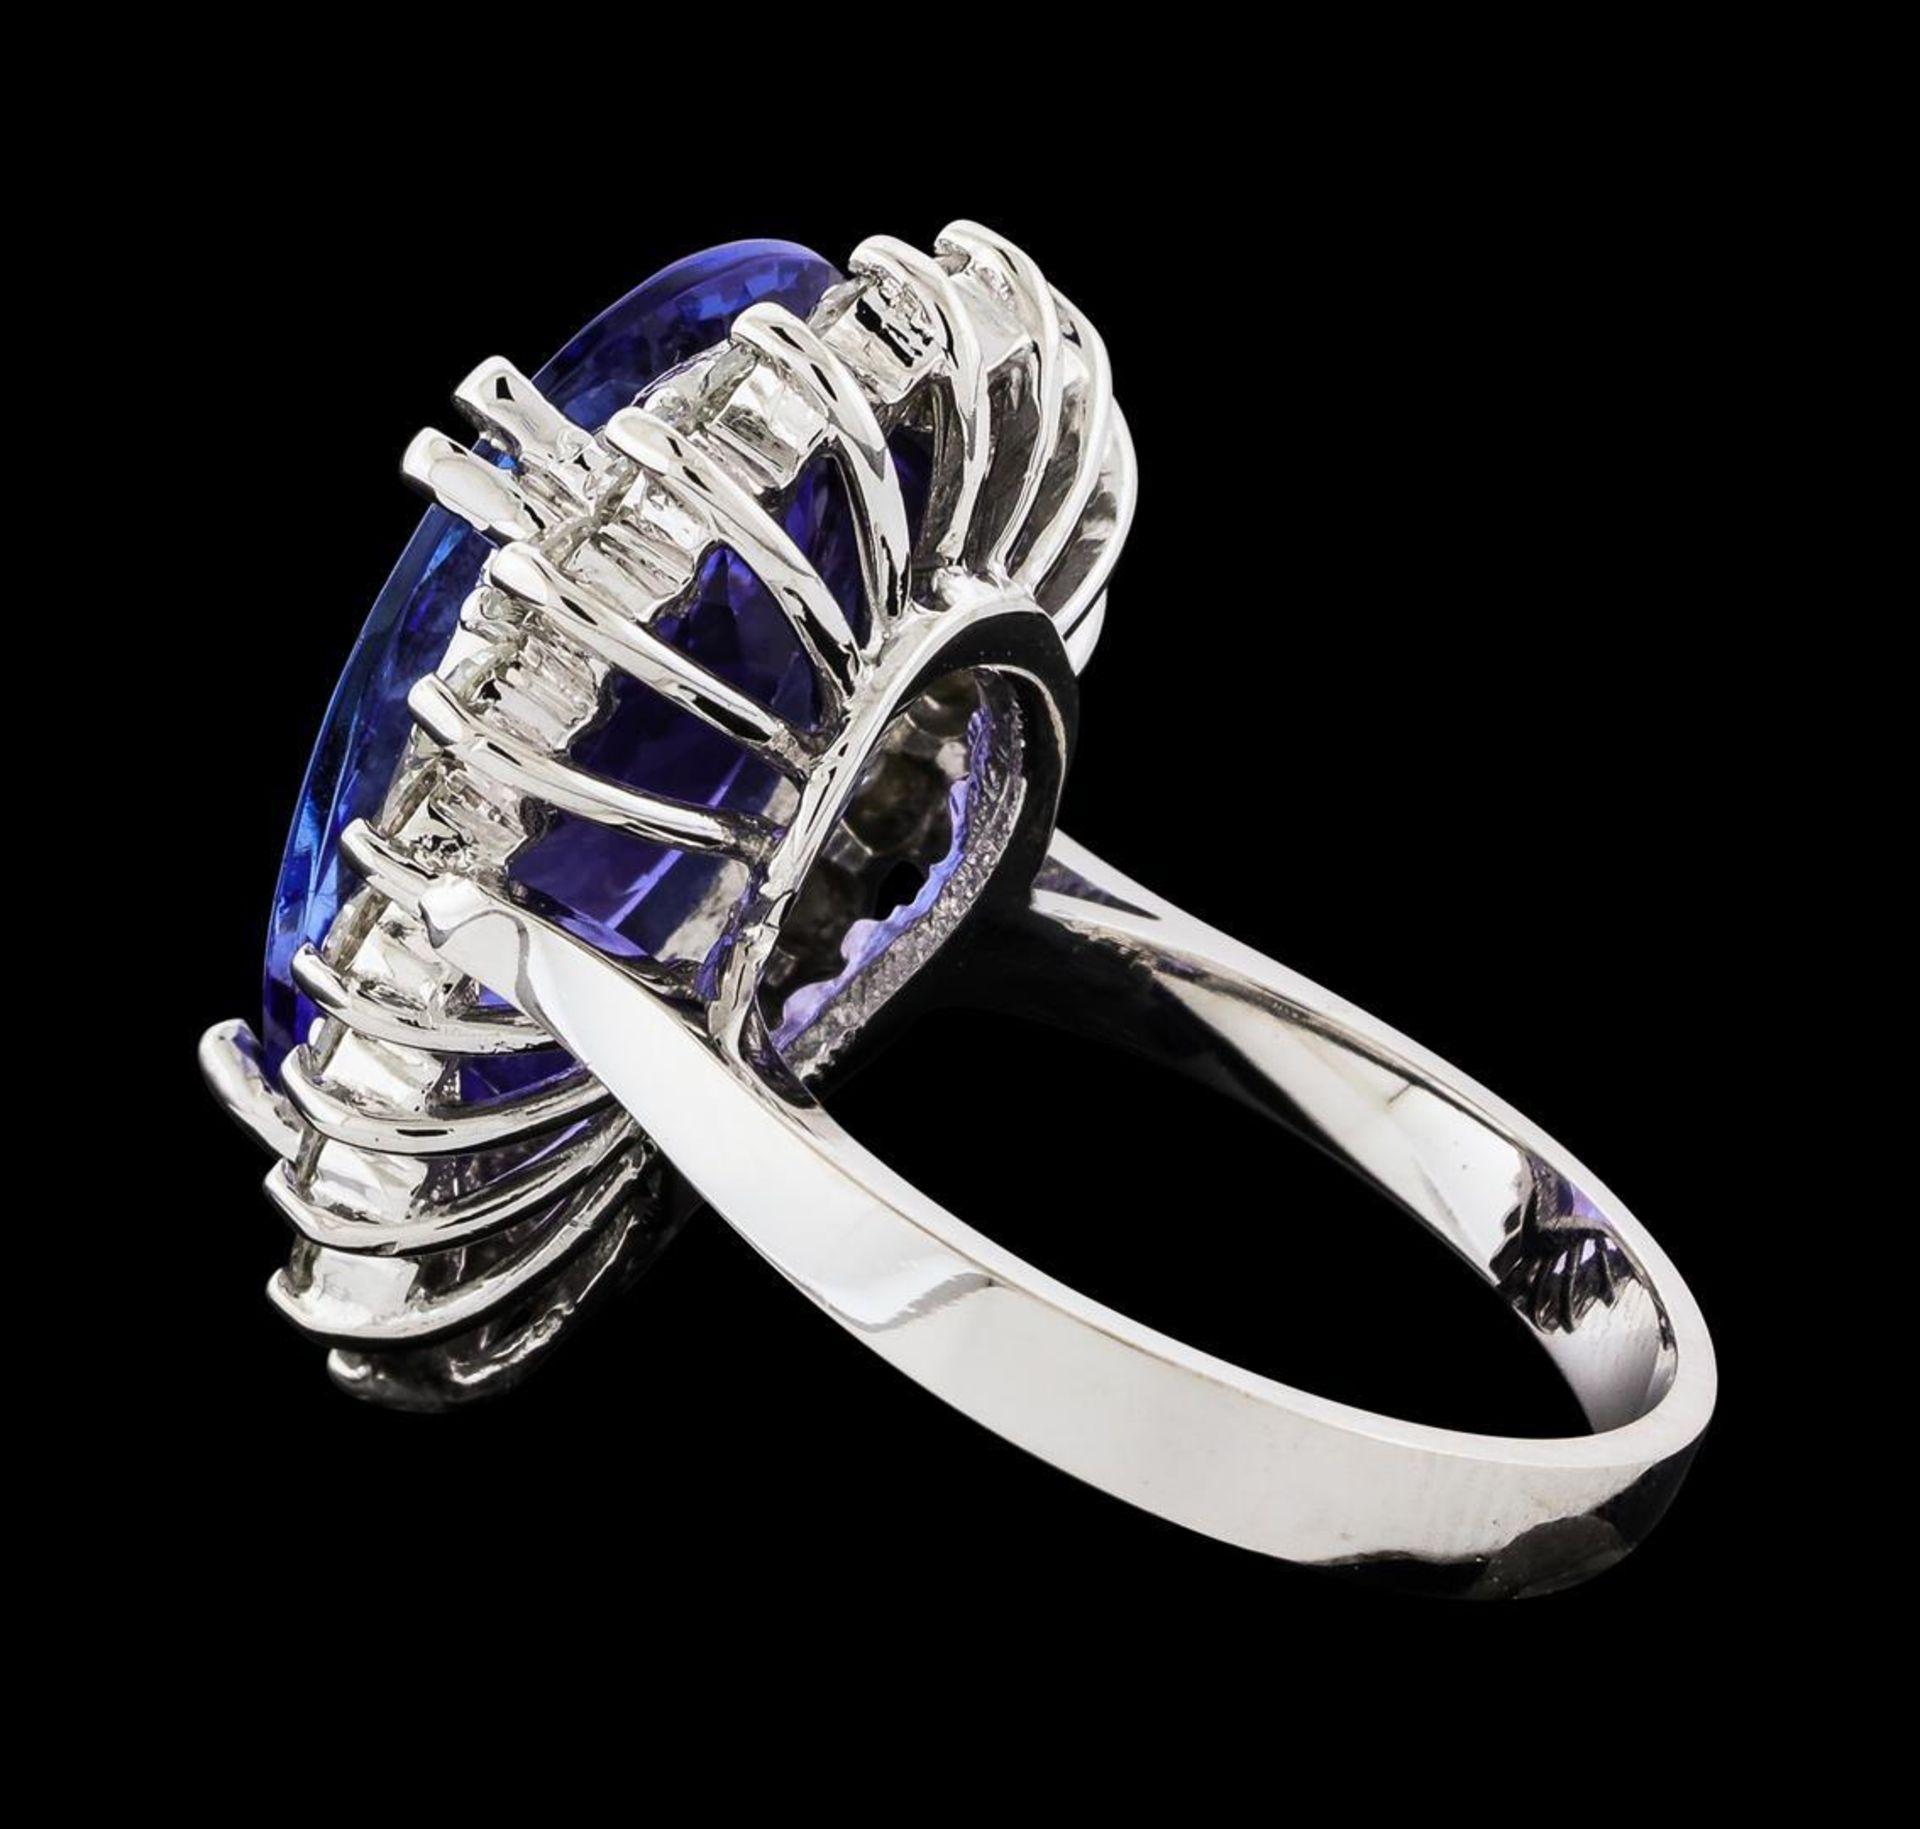 GIA Cert 8.74 ctw Tanzanite and Diamond Ring - 14KT White Gold - Image 3 of 6